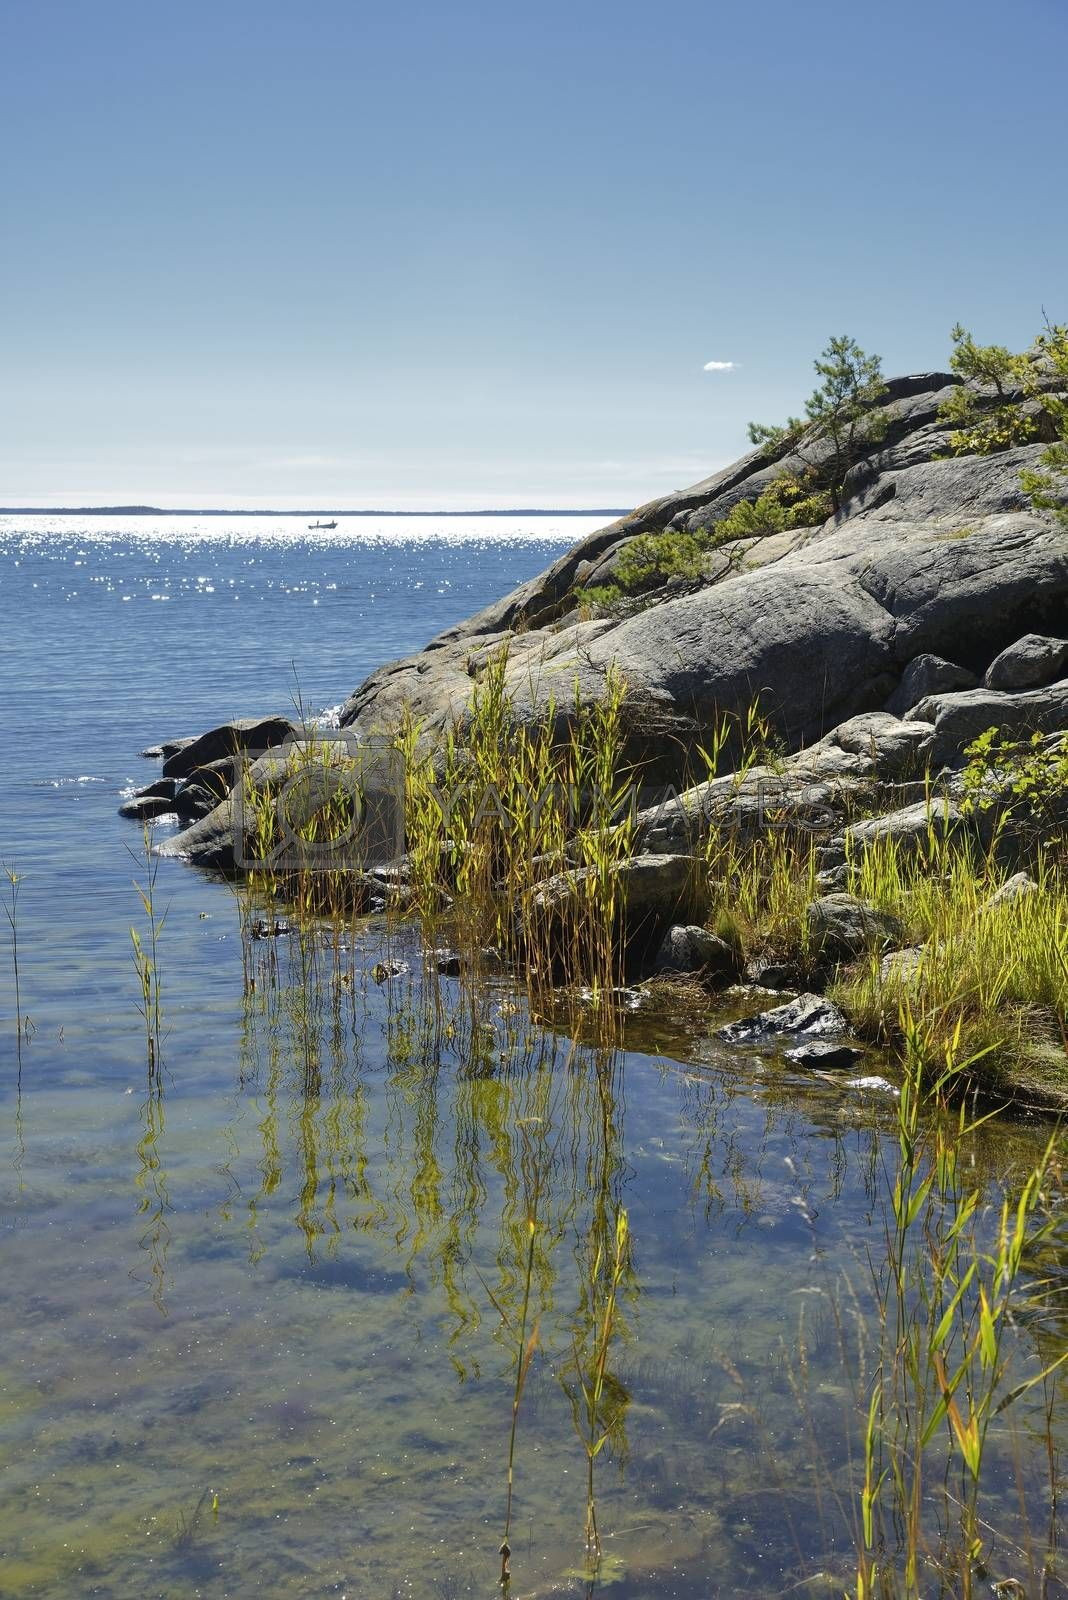 Seascape, Stockholm archipelago.